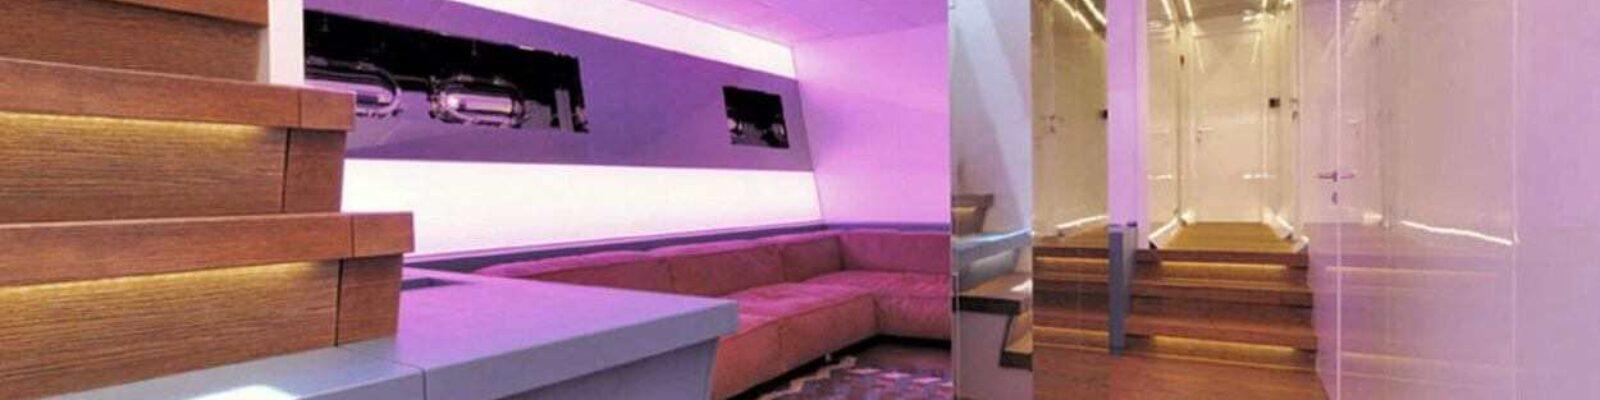 Yacht Mangusta 130 MAO internal view - retail lighting design